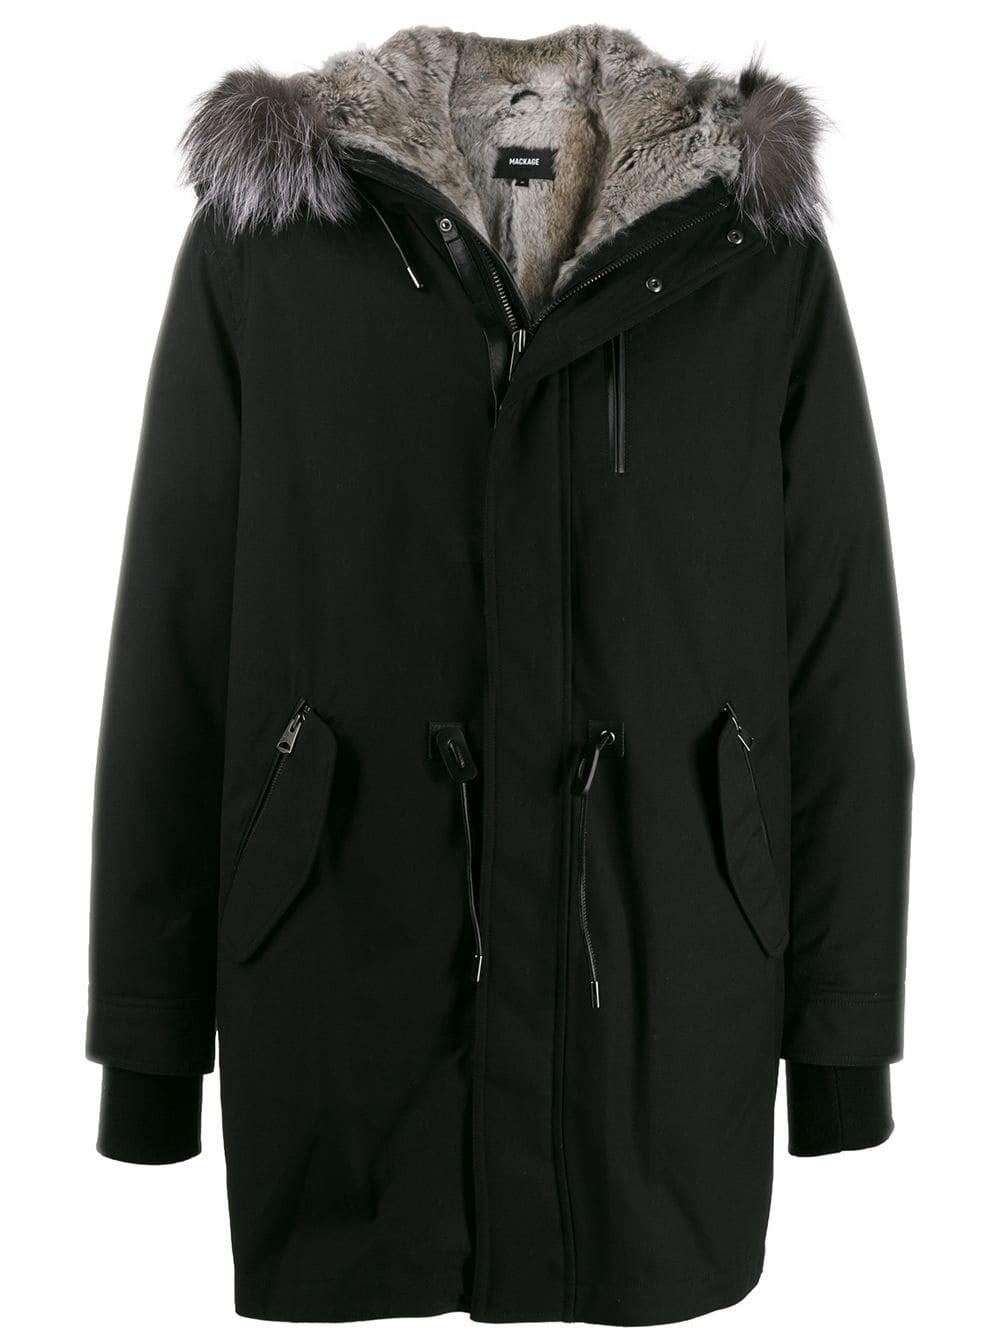 MACKAGE Black Moritz Jacket